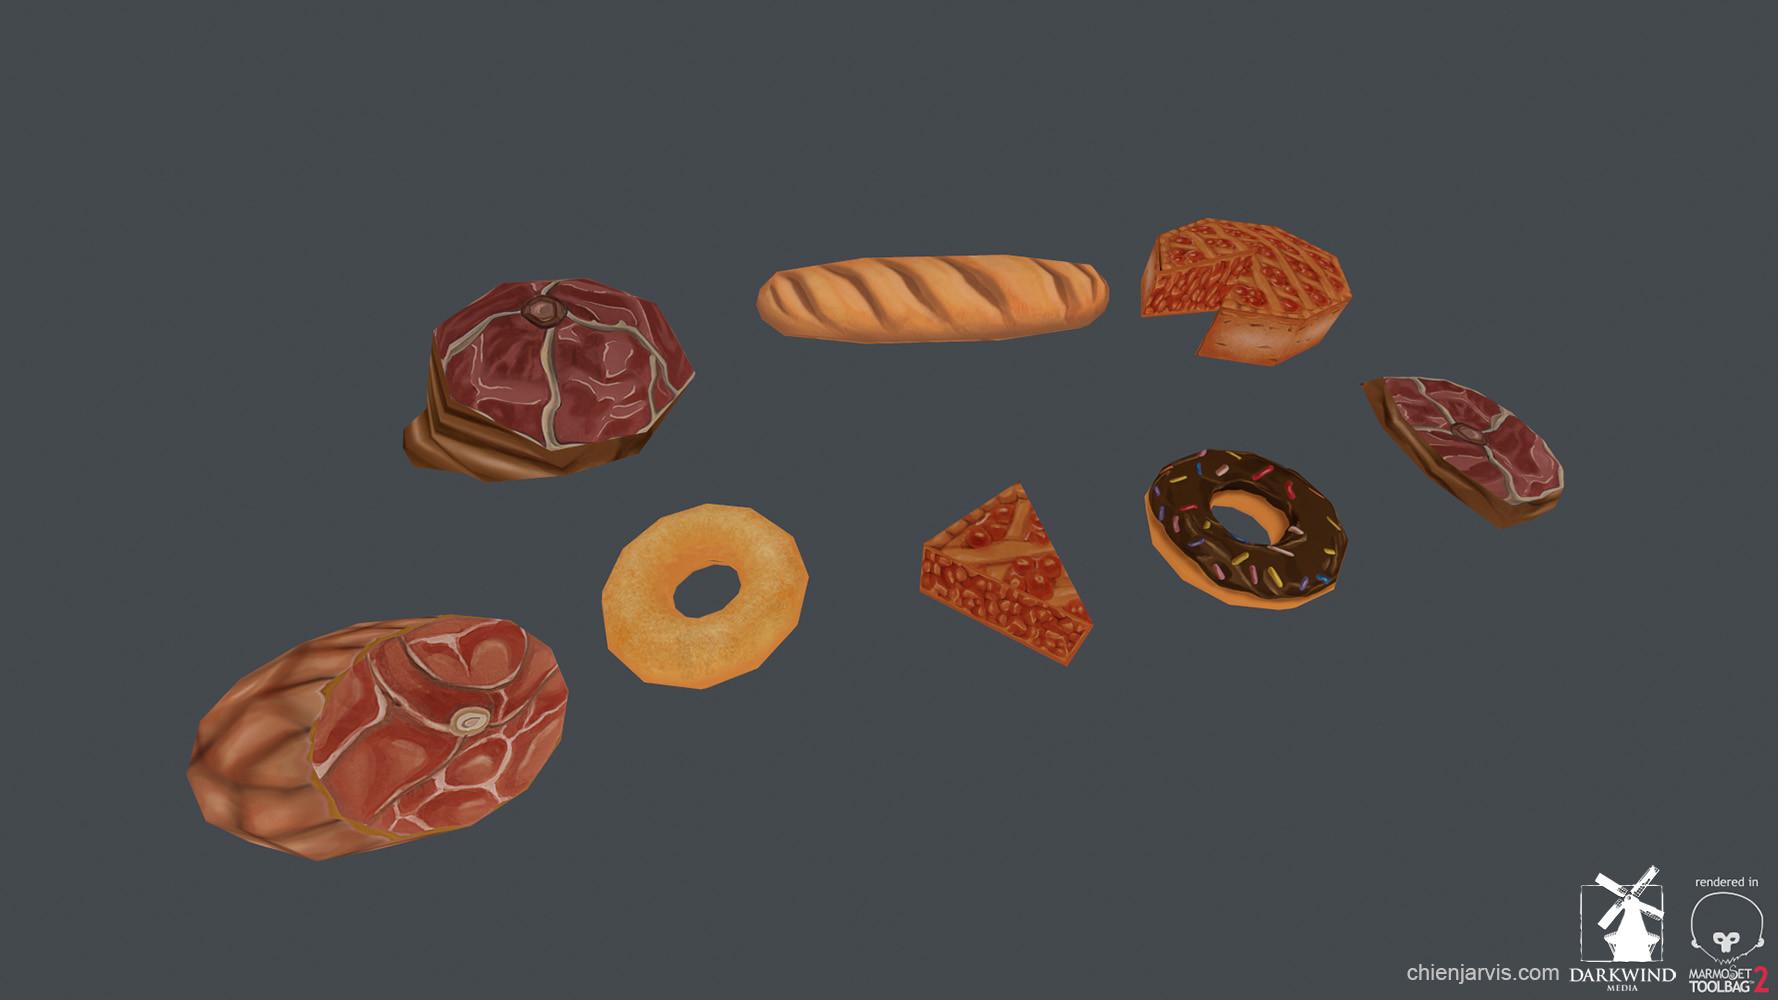 Chien jarvis foods